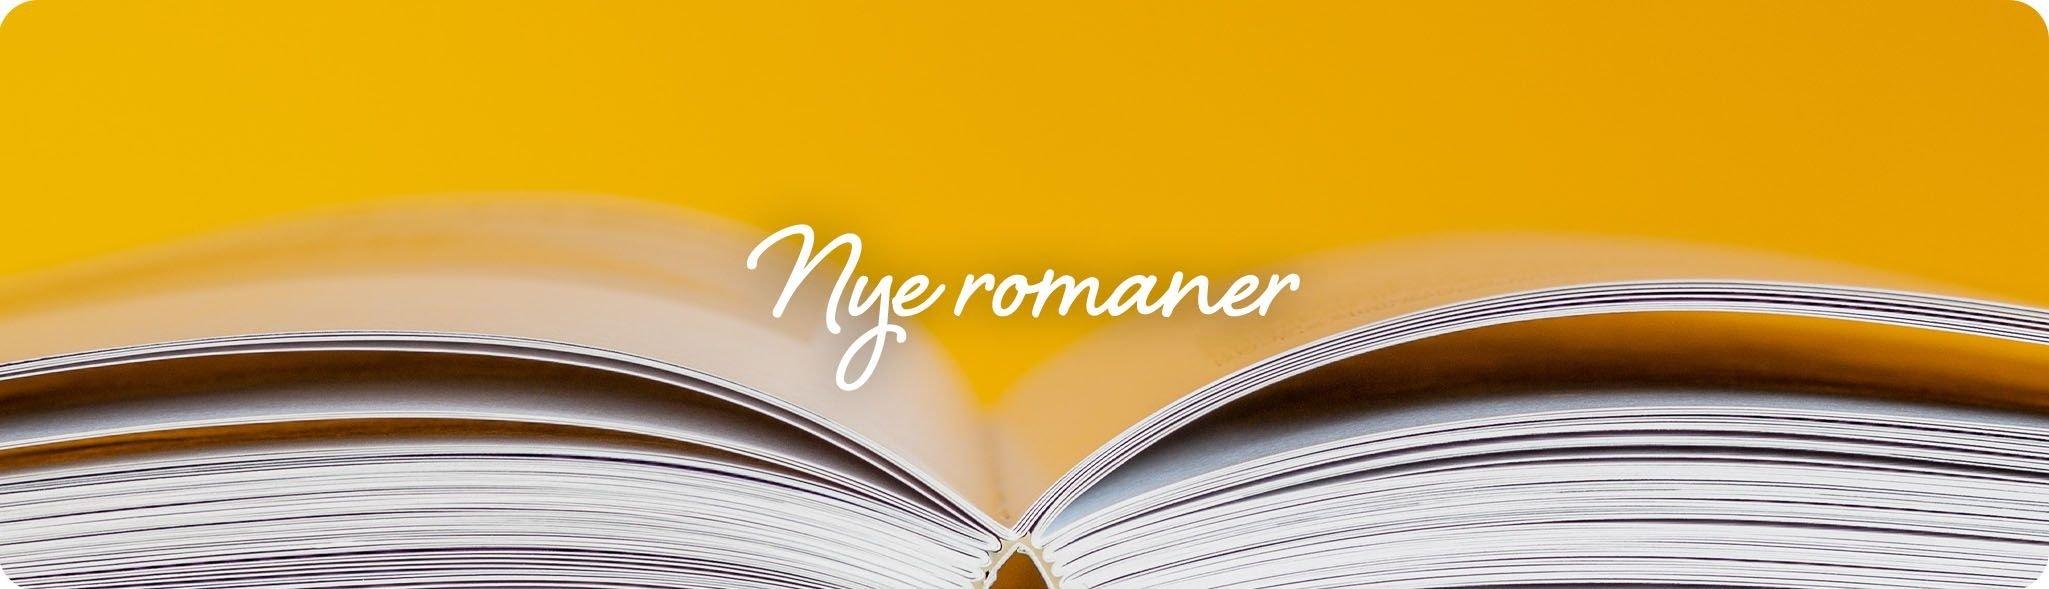 Nye romaner